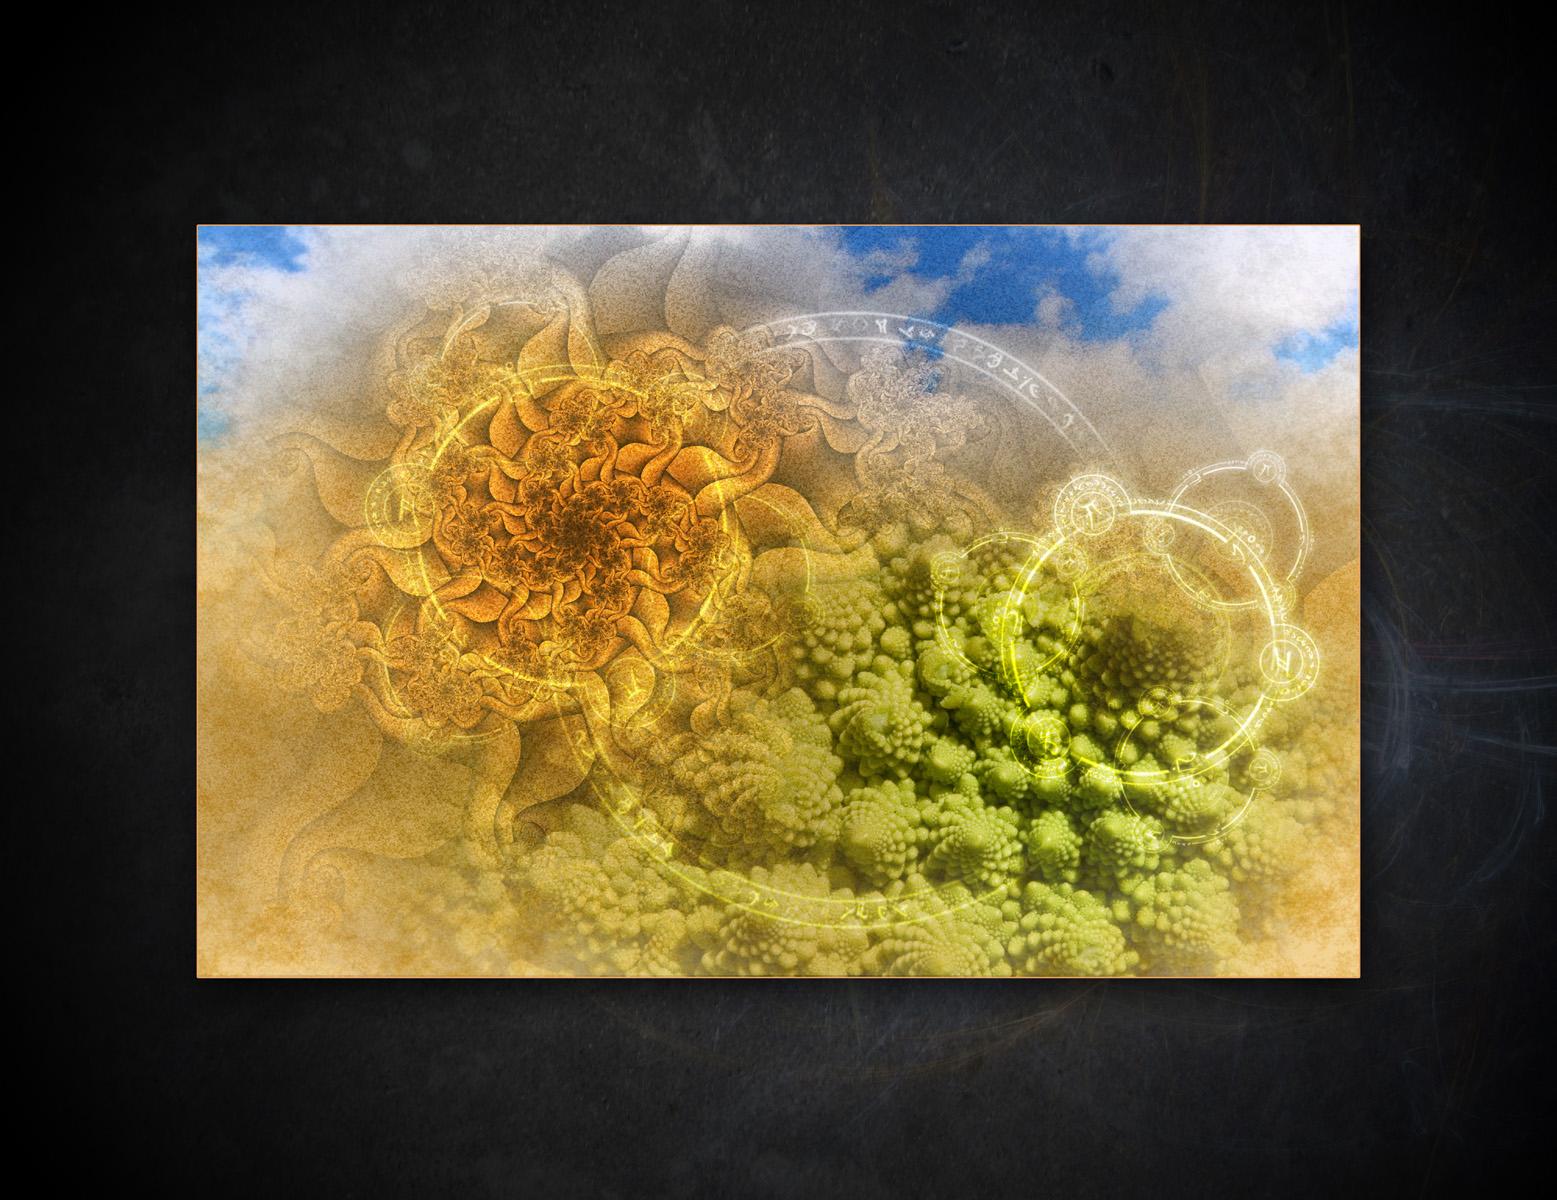 Textural_005 Elemental swirl.jpg